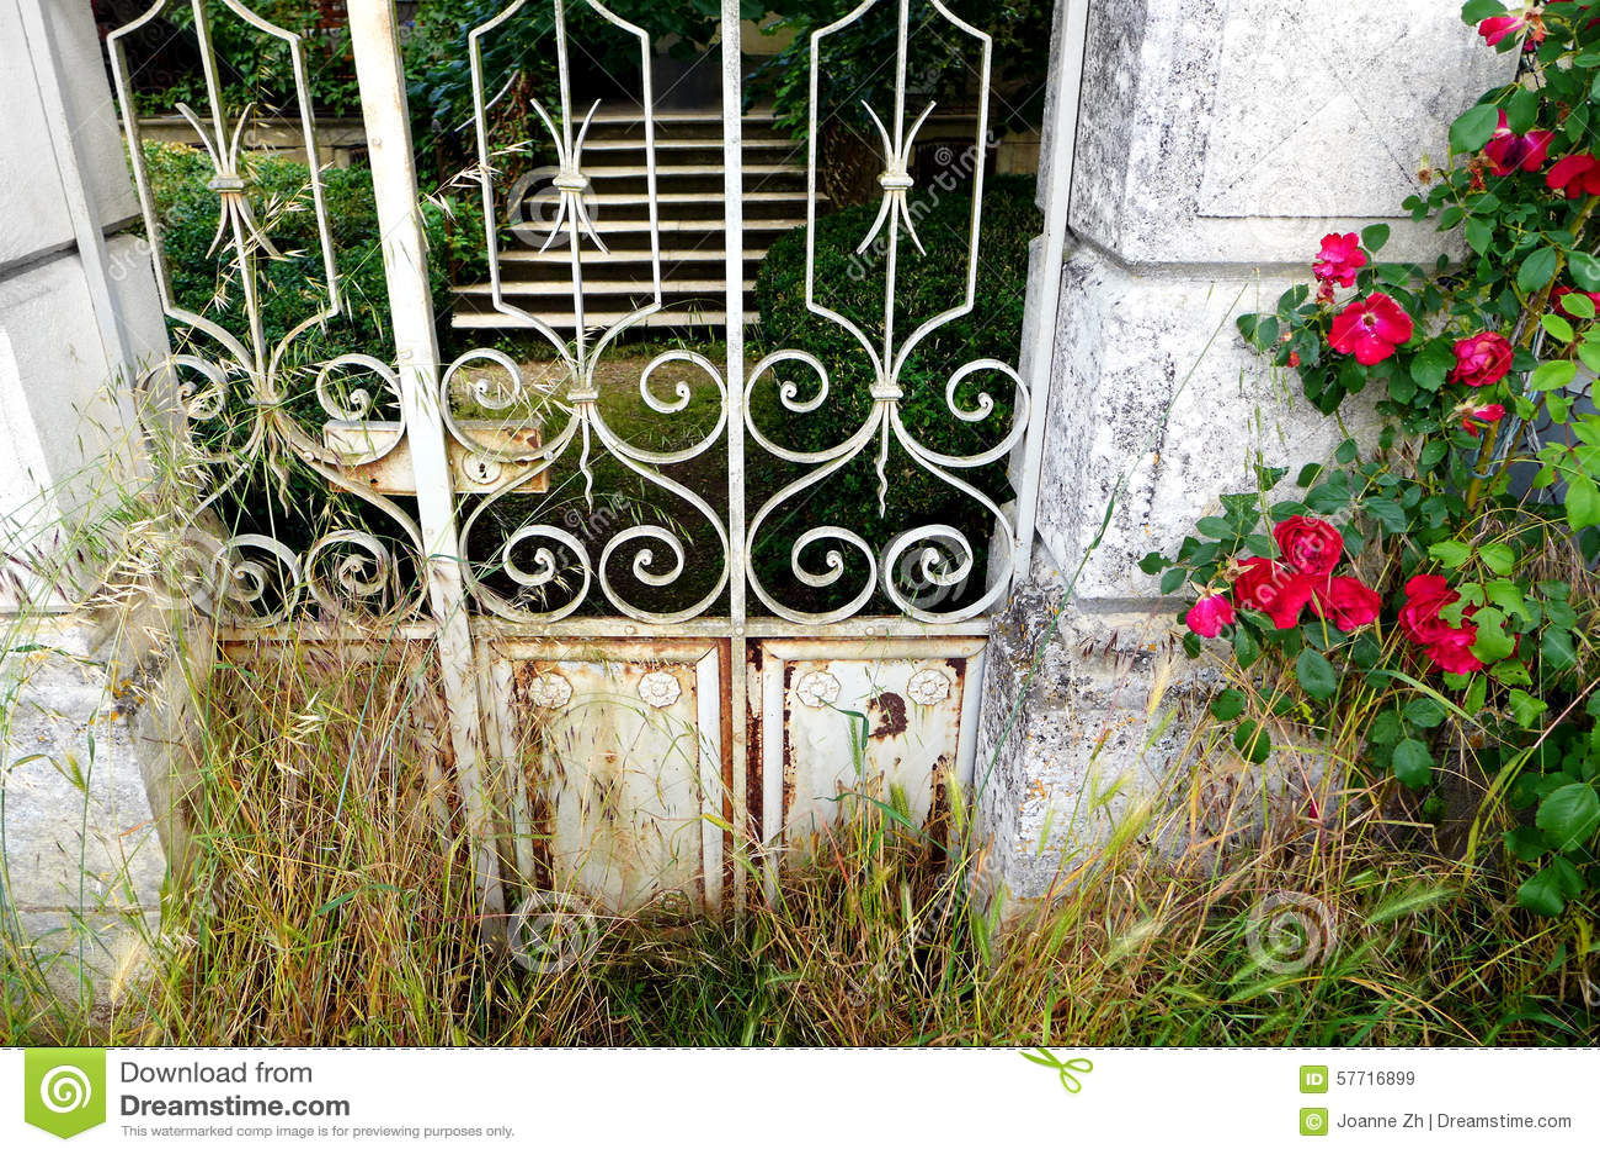 Awesome Porte Francaise De Jardin Gallery - Amazing House Design ...